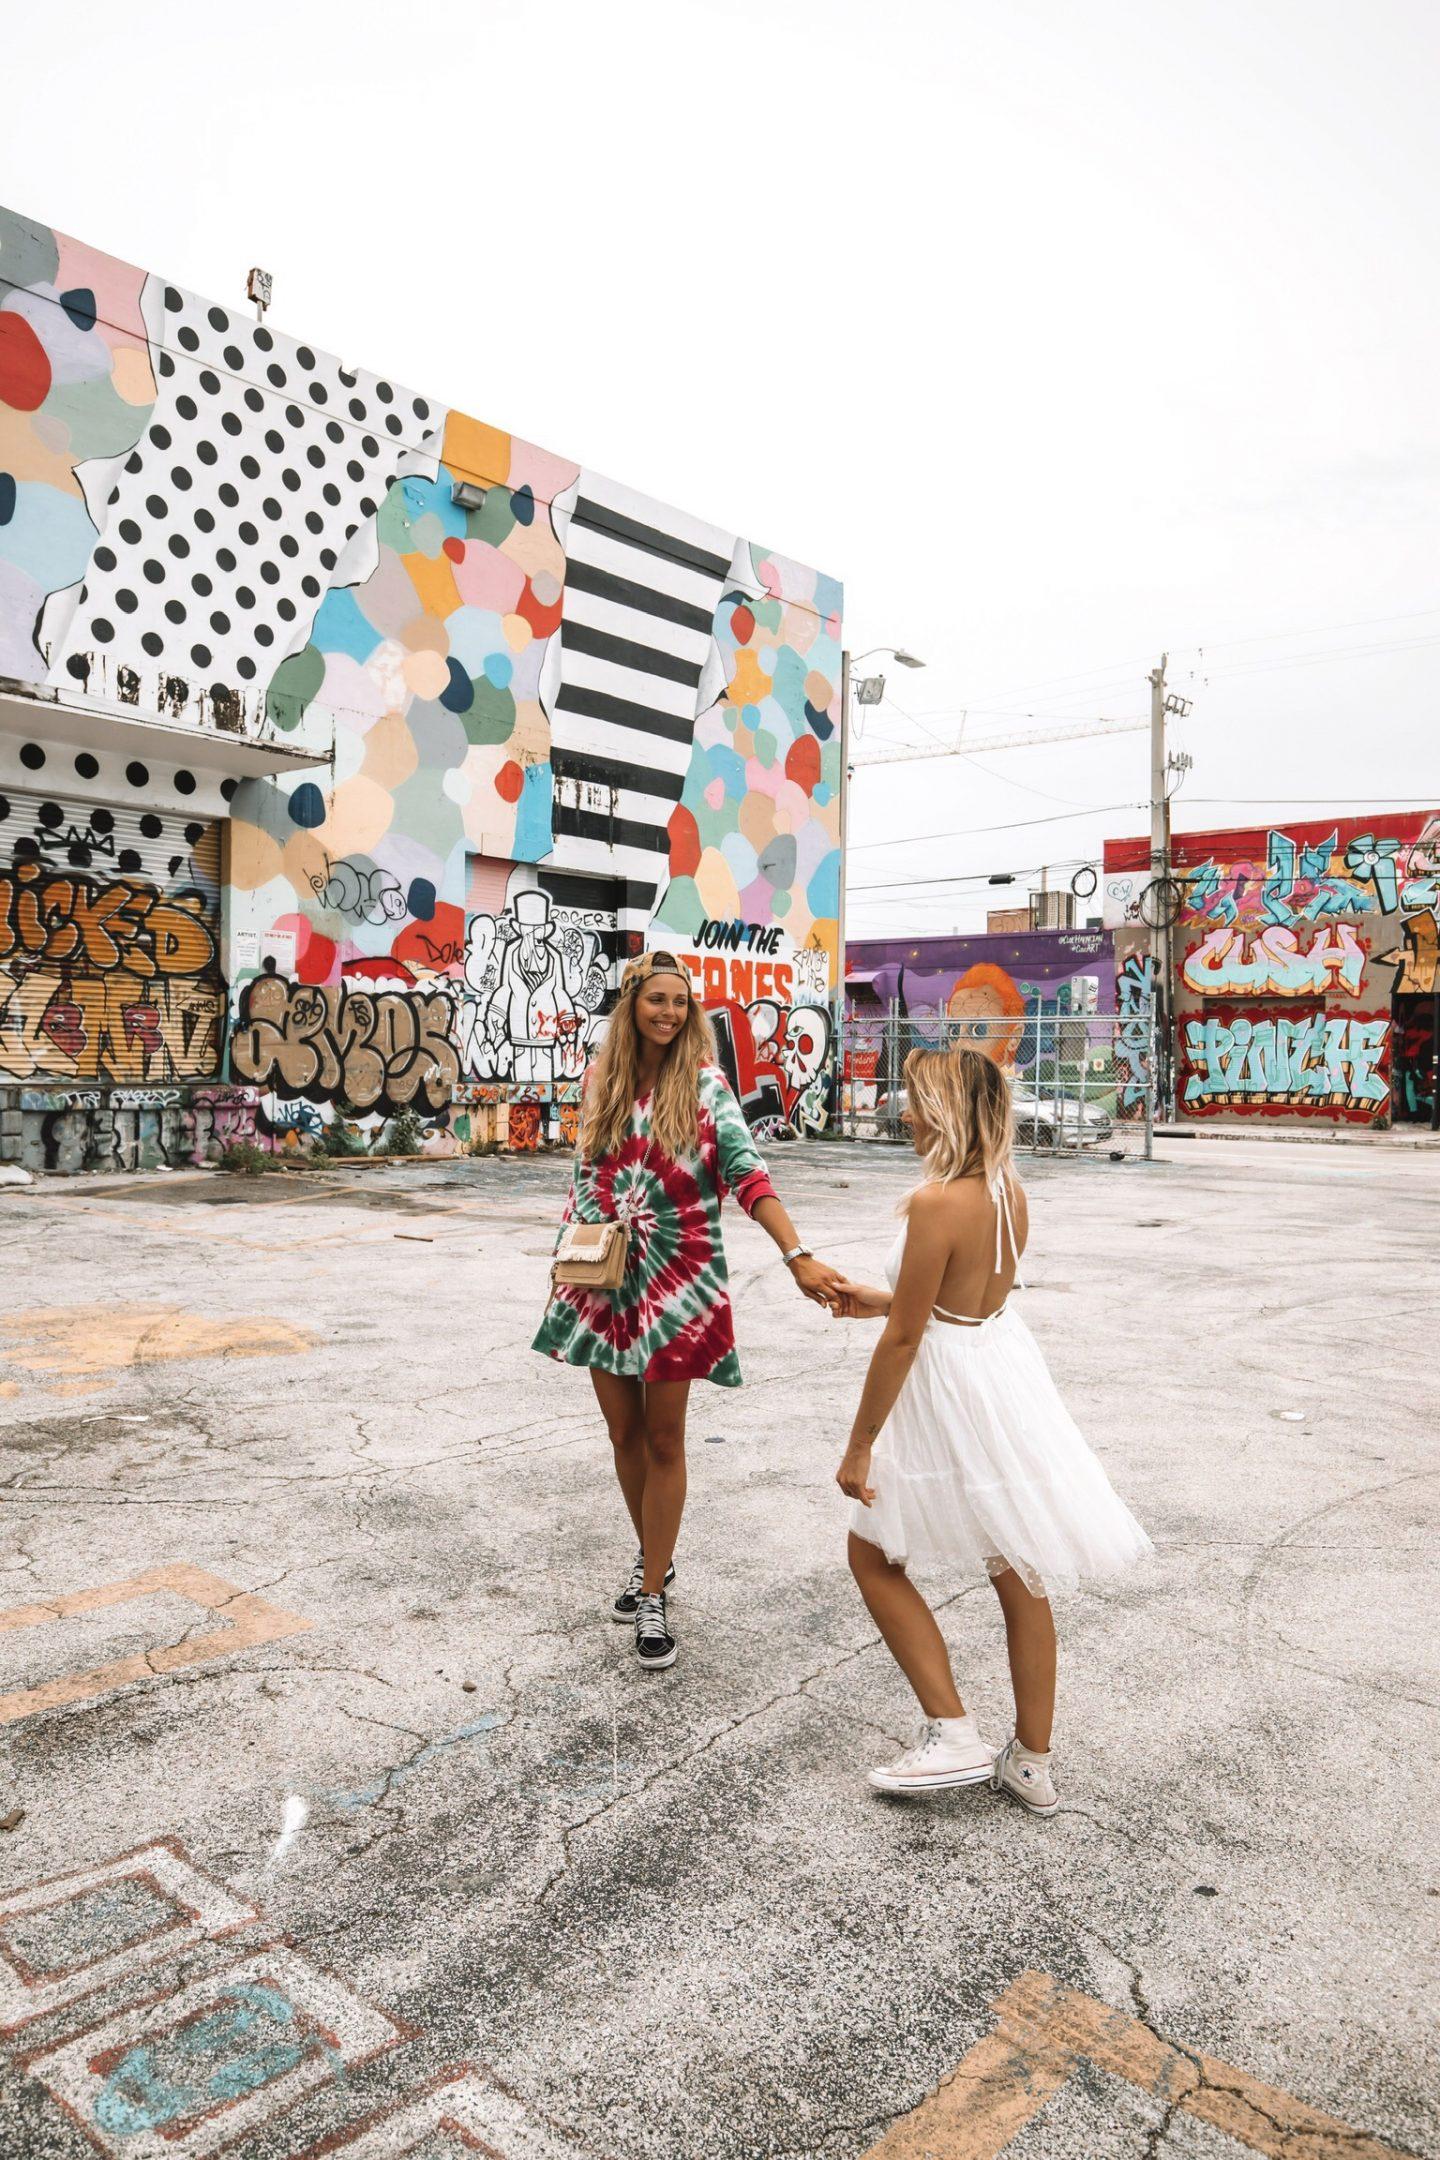 Visiter Wynwood - Blondie Baby blog mode et voyages